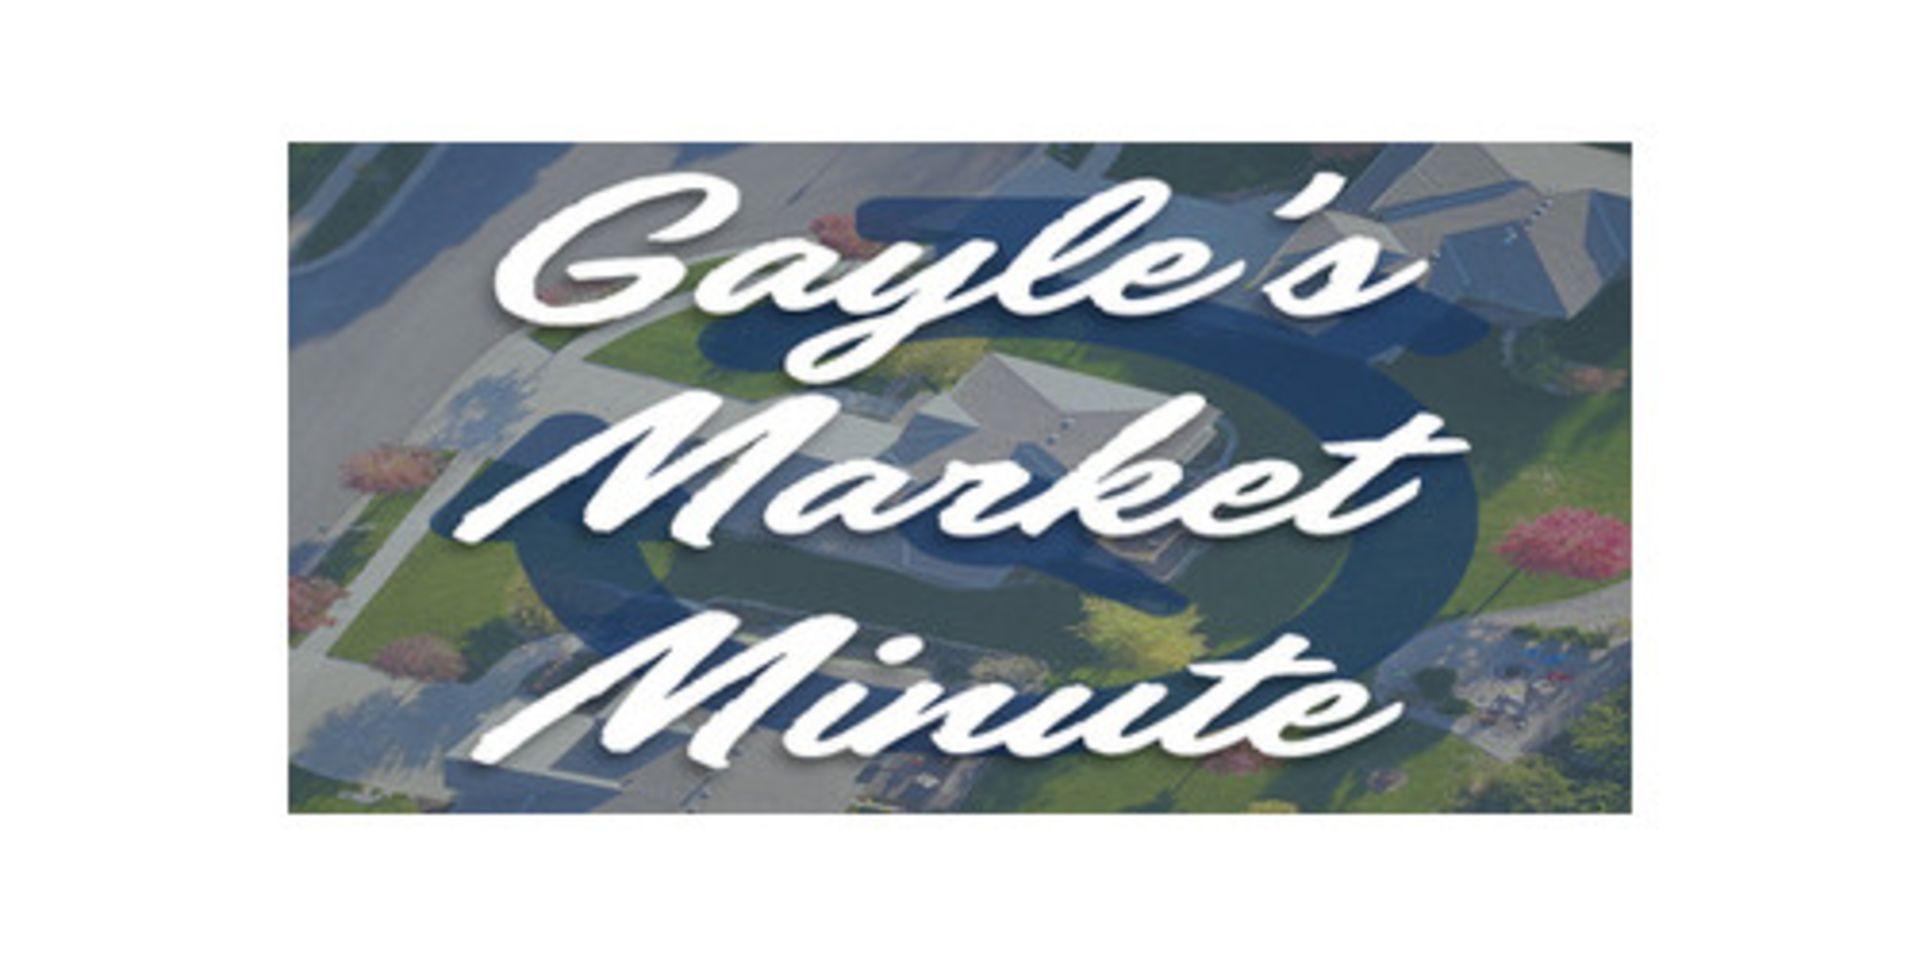 Gayle's Market Minute